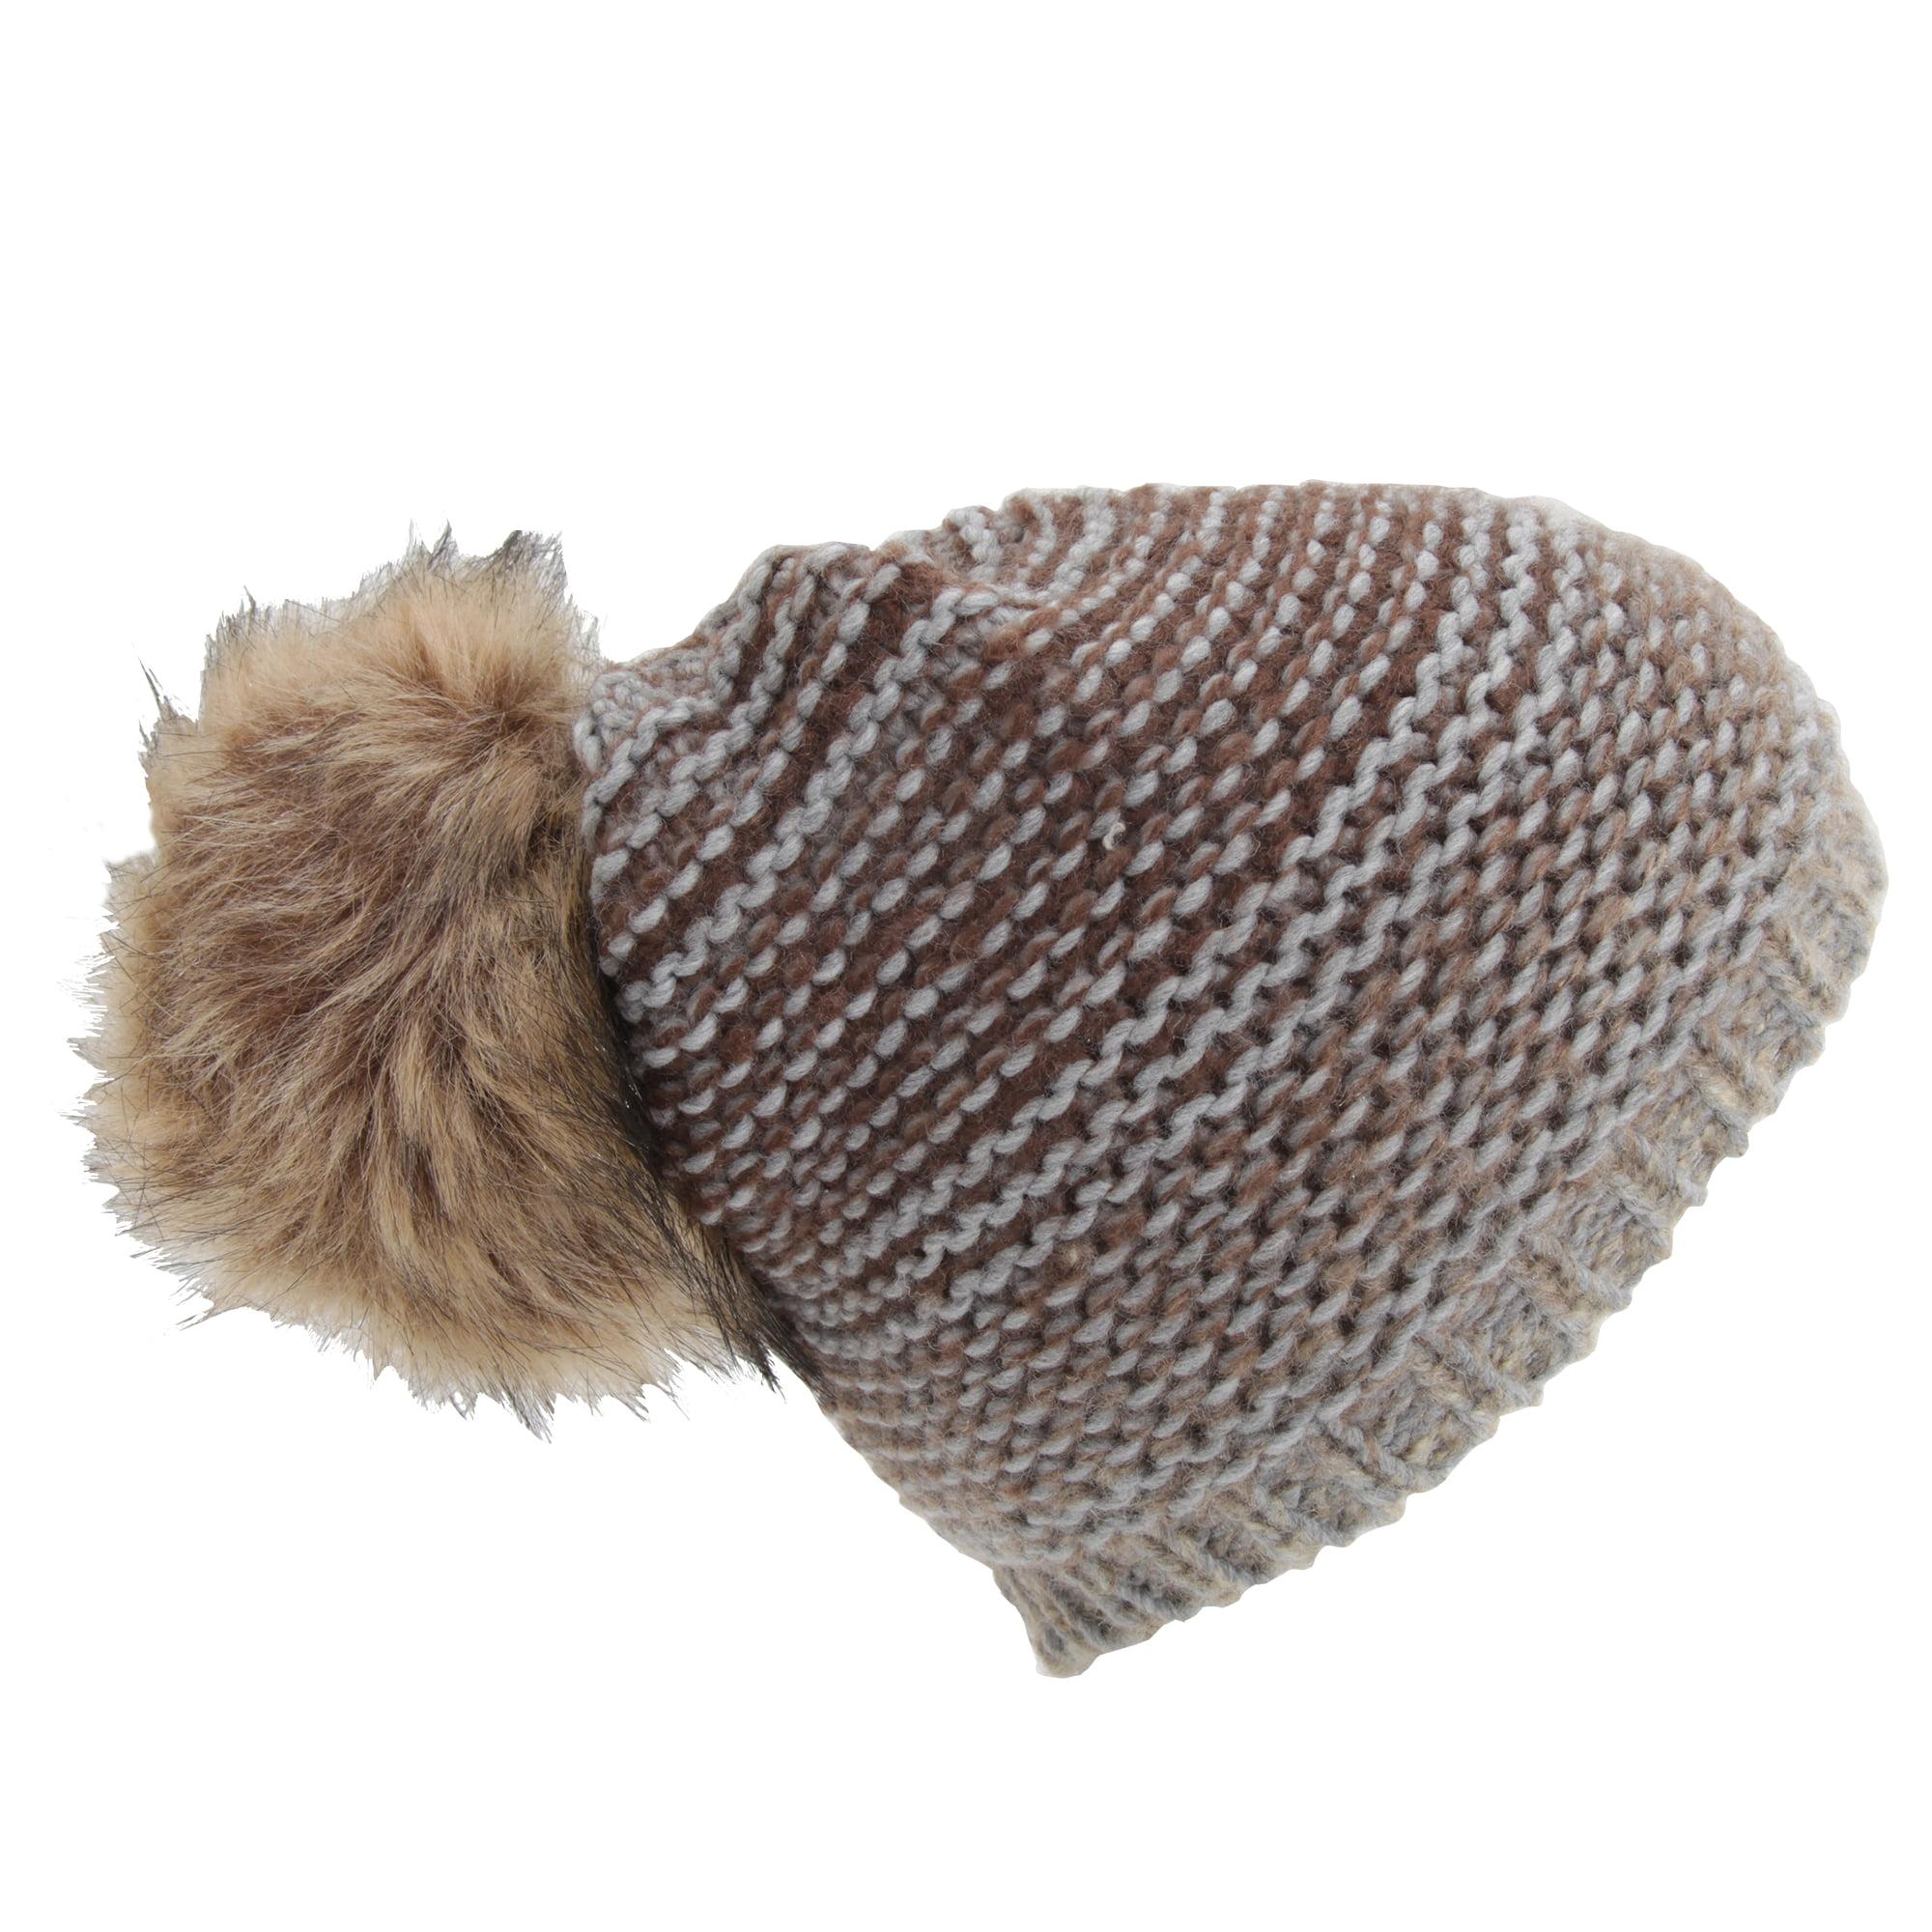 7c40ca1d Womens/Ladies Ombre Knit Winter Beanie Hat With Faux Fur Pom Pom